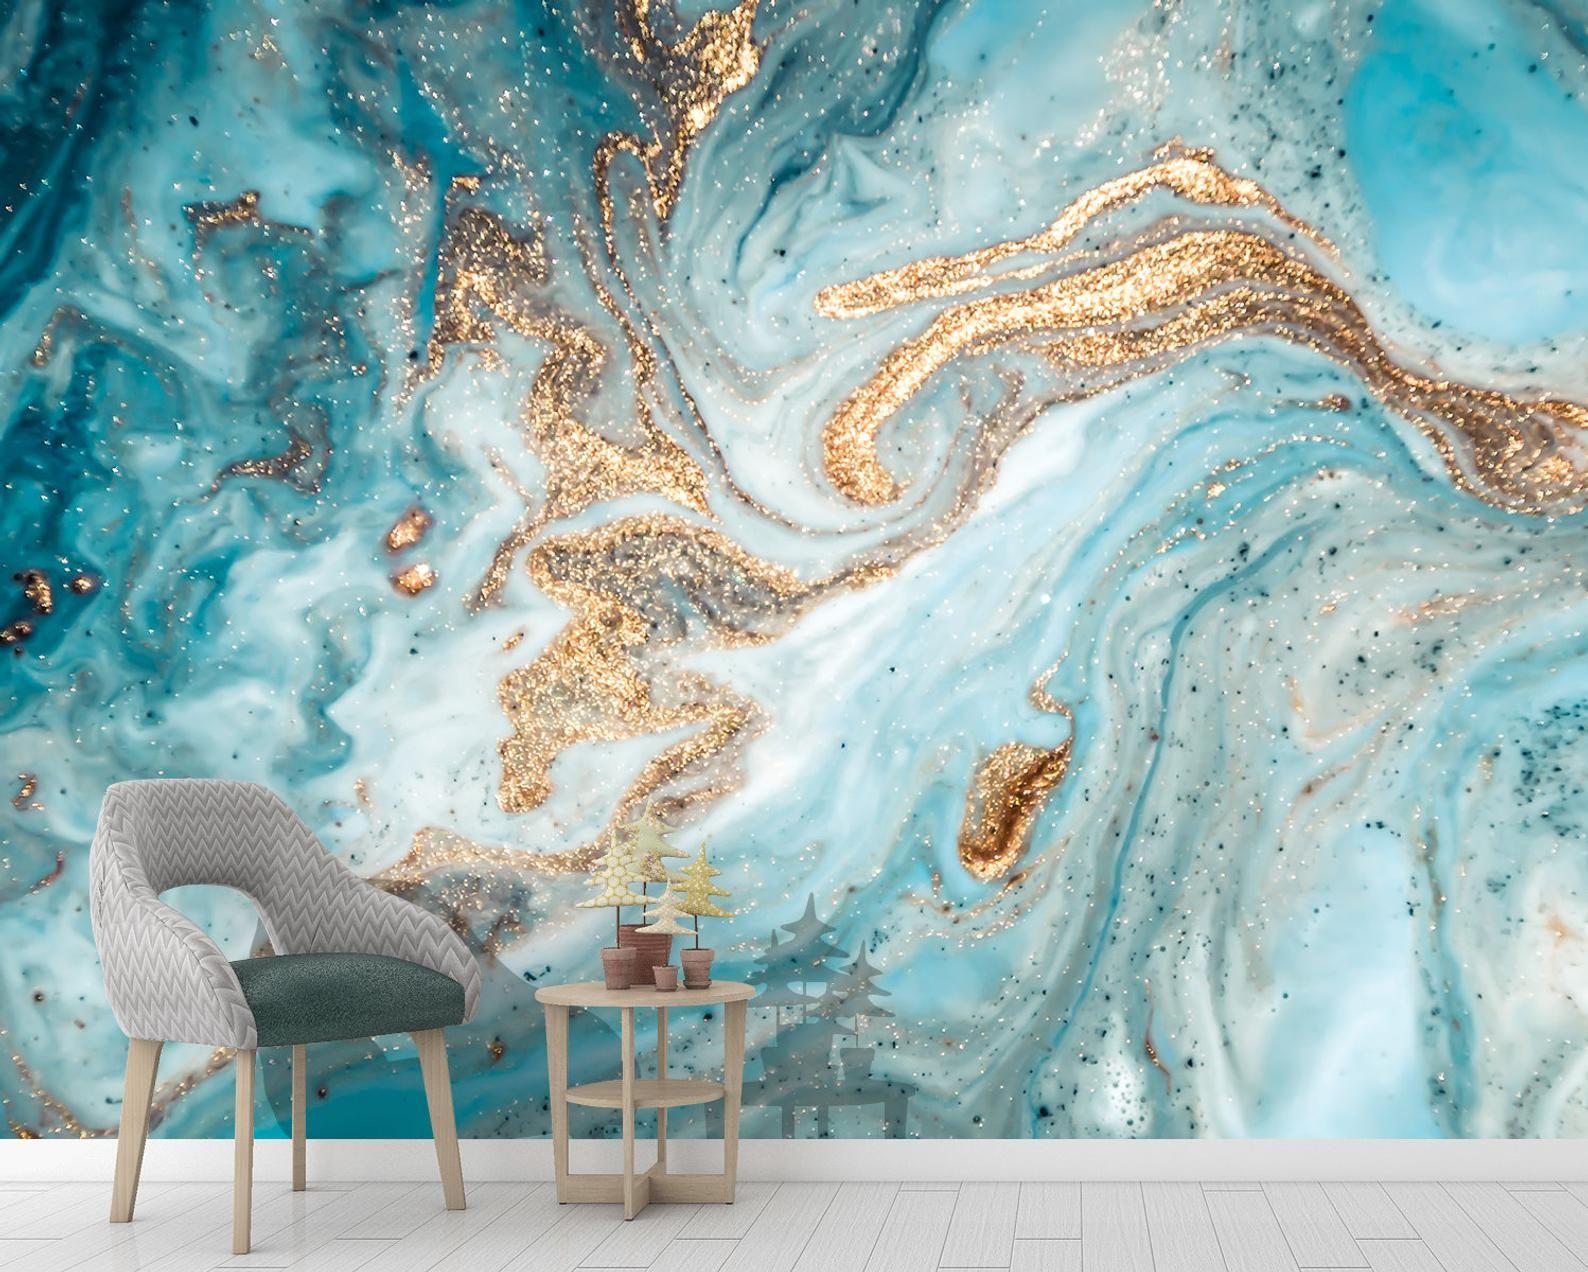 Does Wallpaper Work On Textured Walls Bathroom Accent Wall Wallpaper Accent Wall Bathroom Small Bathroom Wallpaper